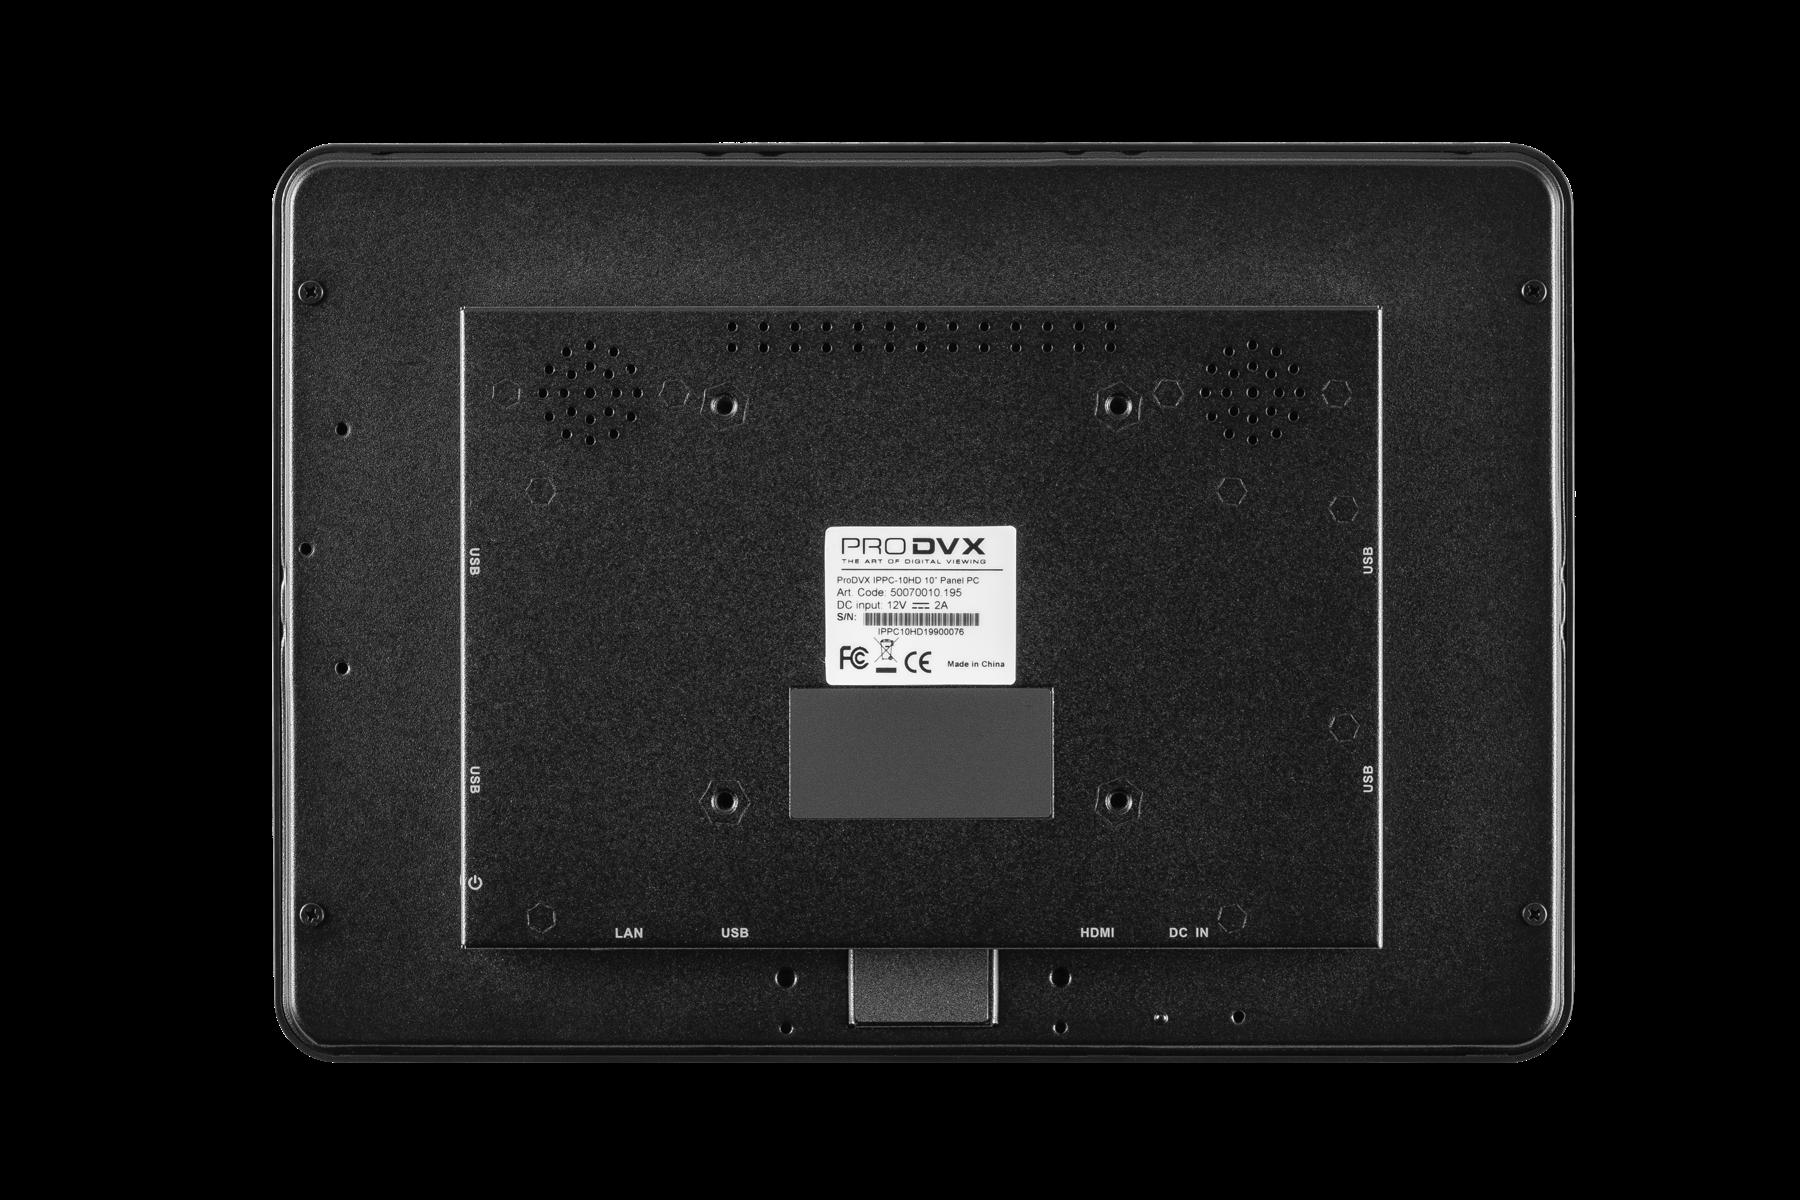 50070010 195 IPPC 10 HD back s1800x